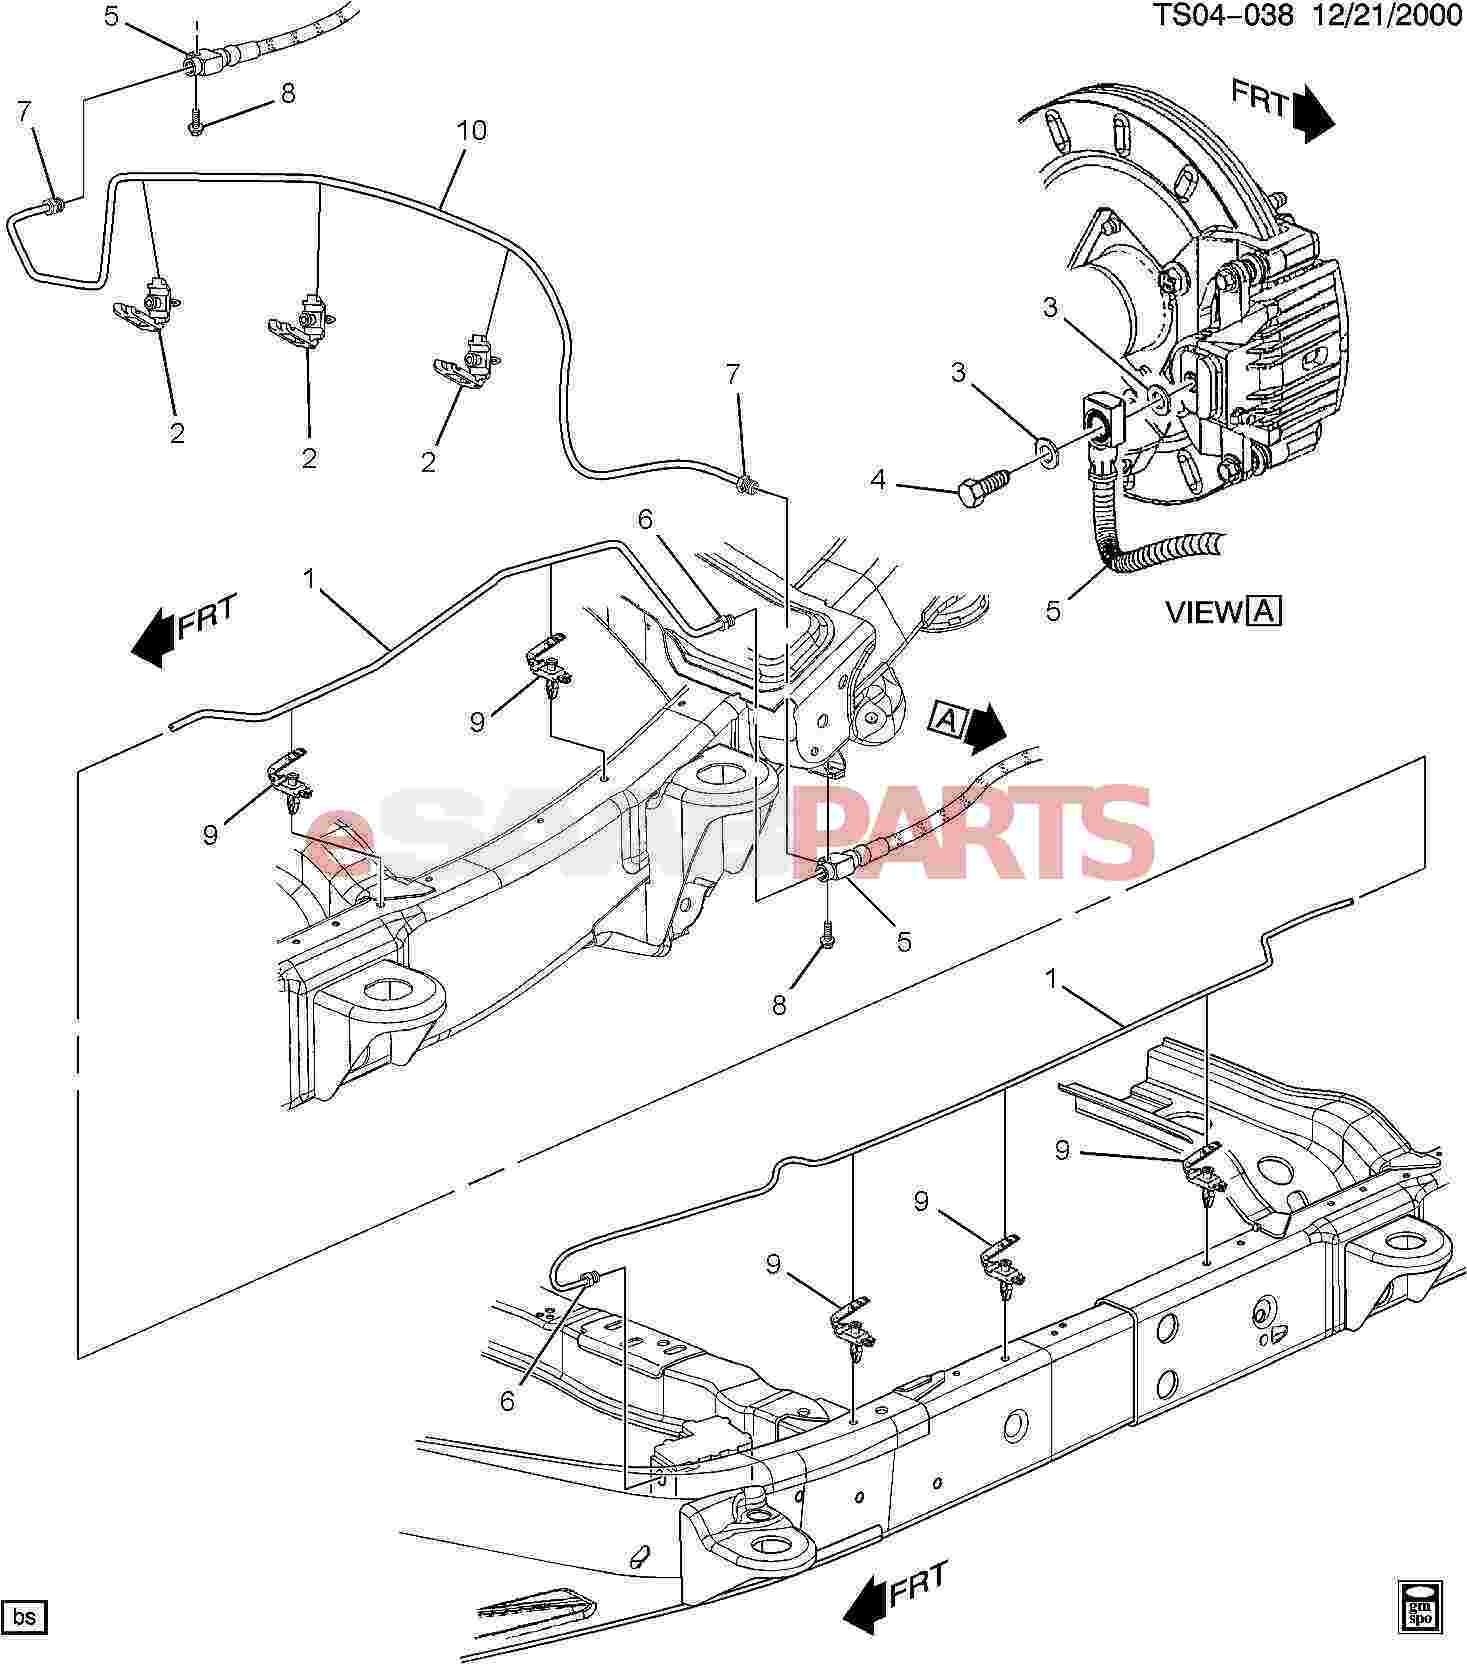 Brake line diagram 2003 gmc envoy parts collection of wiring diagram u2022 rh wiringbase today 2004